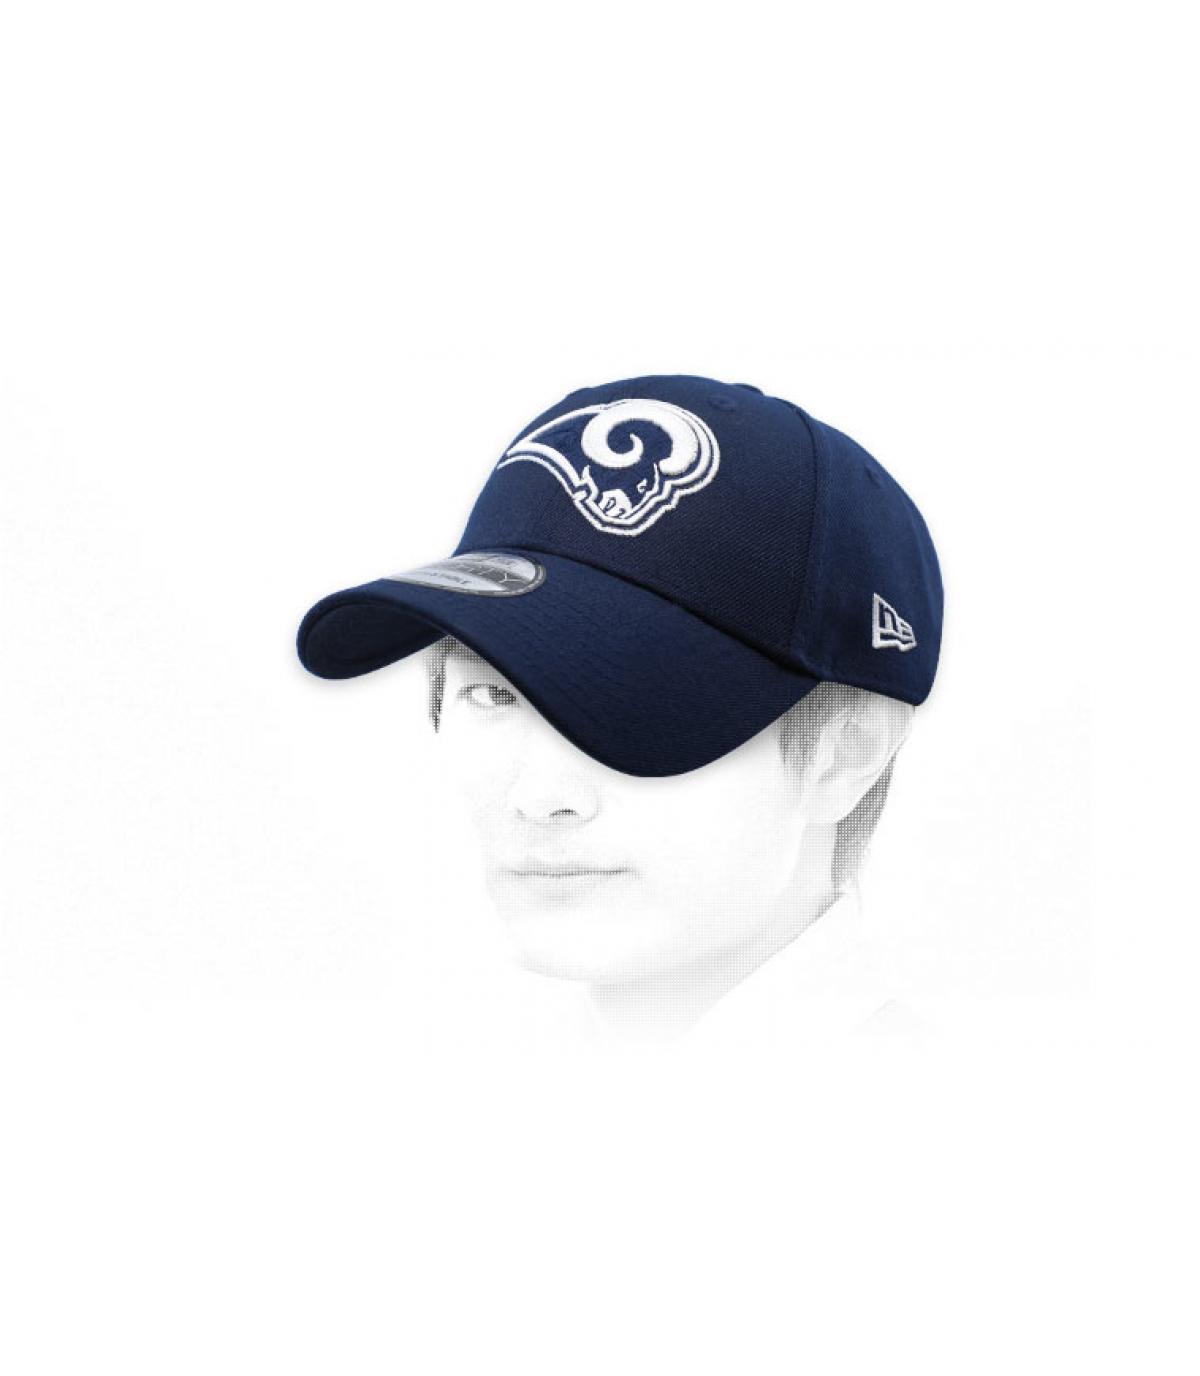 blue Rams curve cap